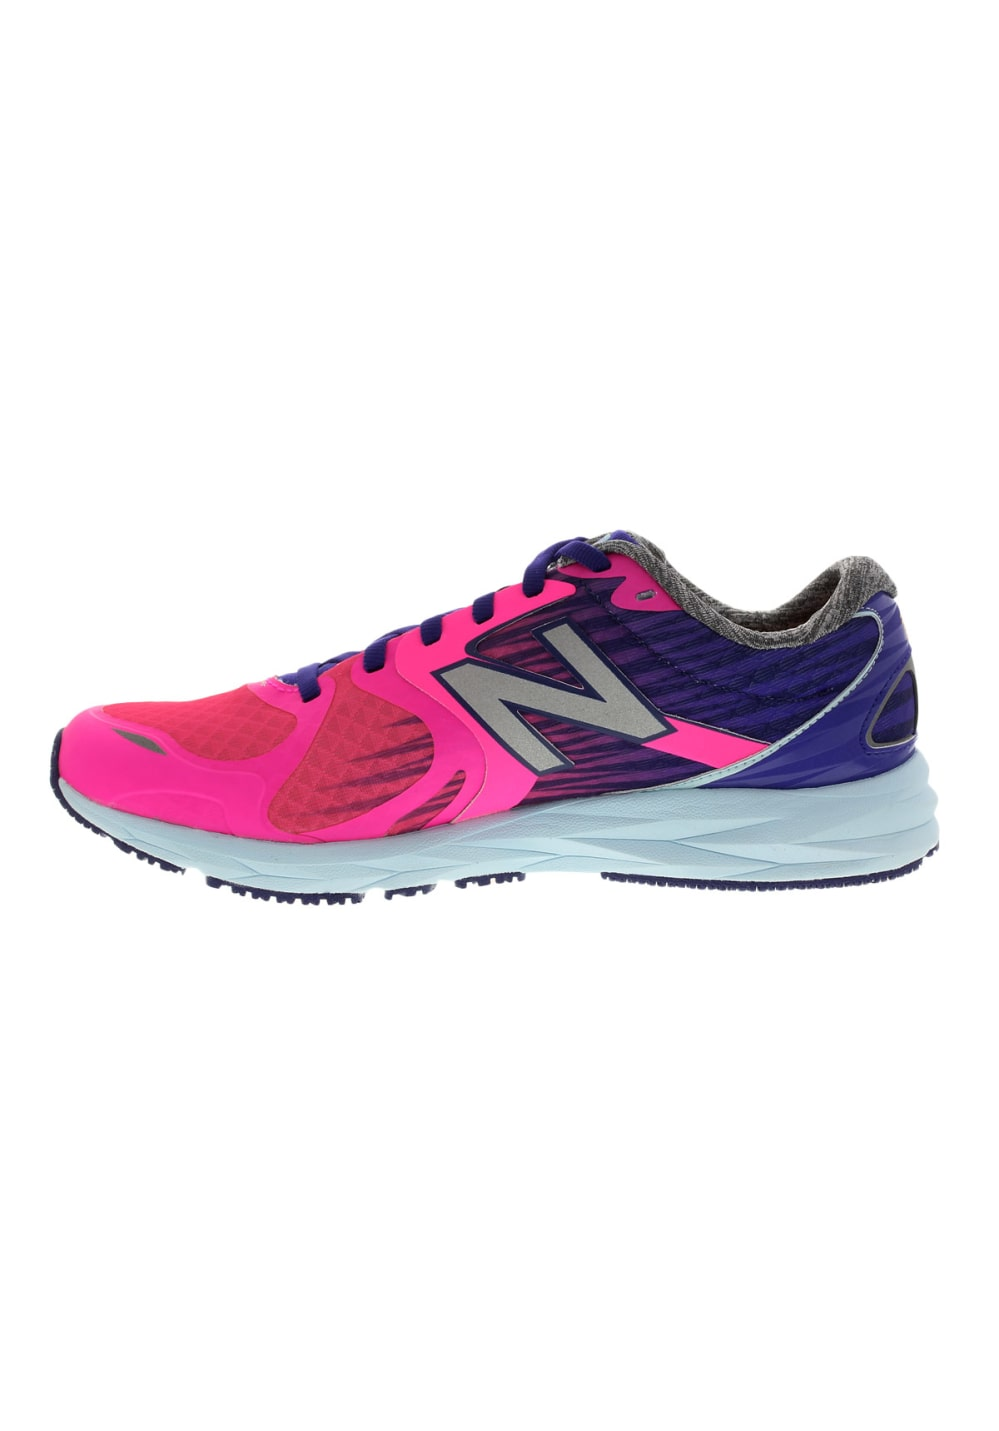 New Balance W 1400 V4 - Running shoes for Women - Purple